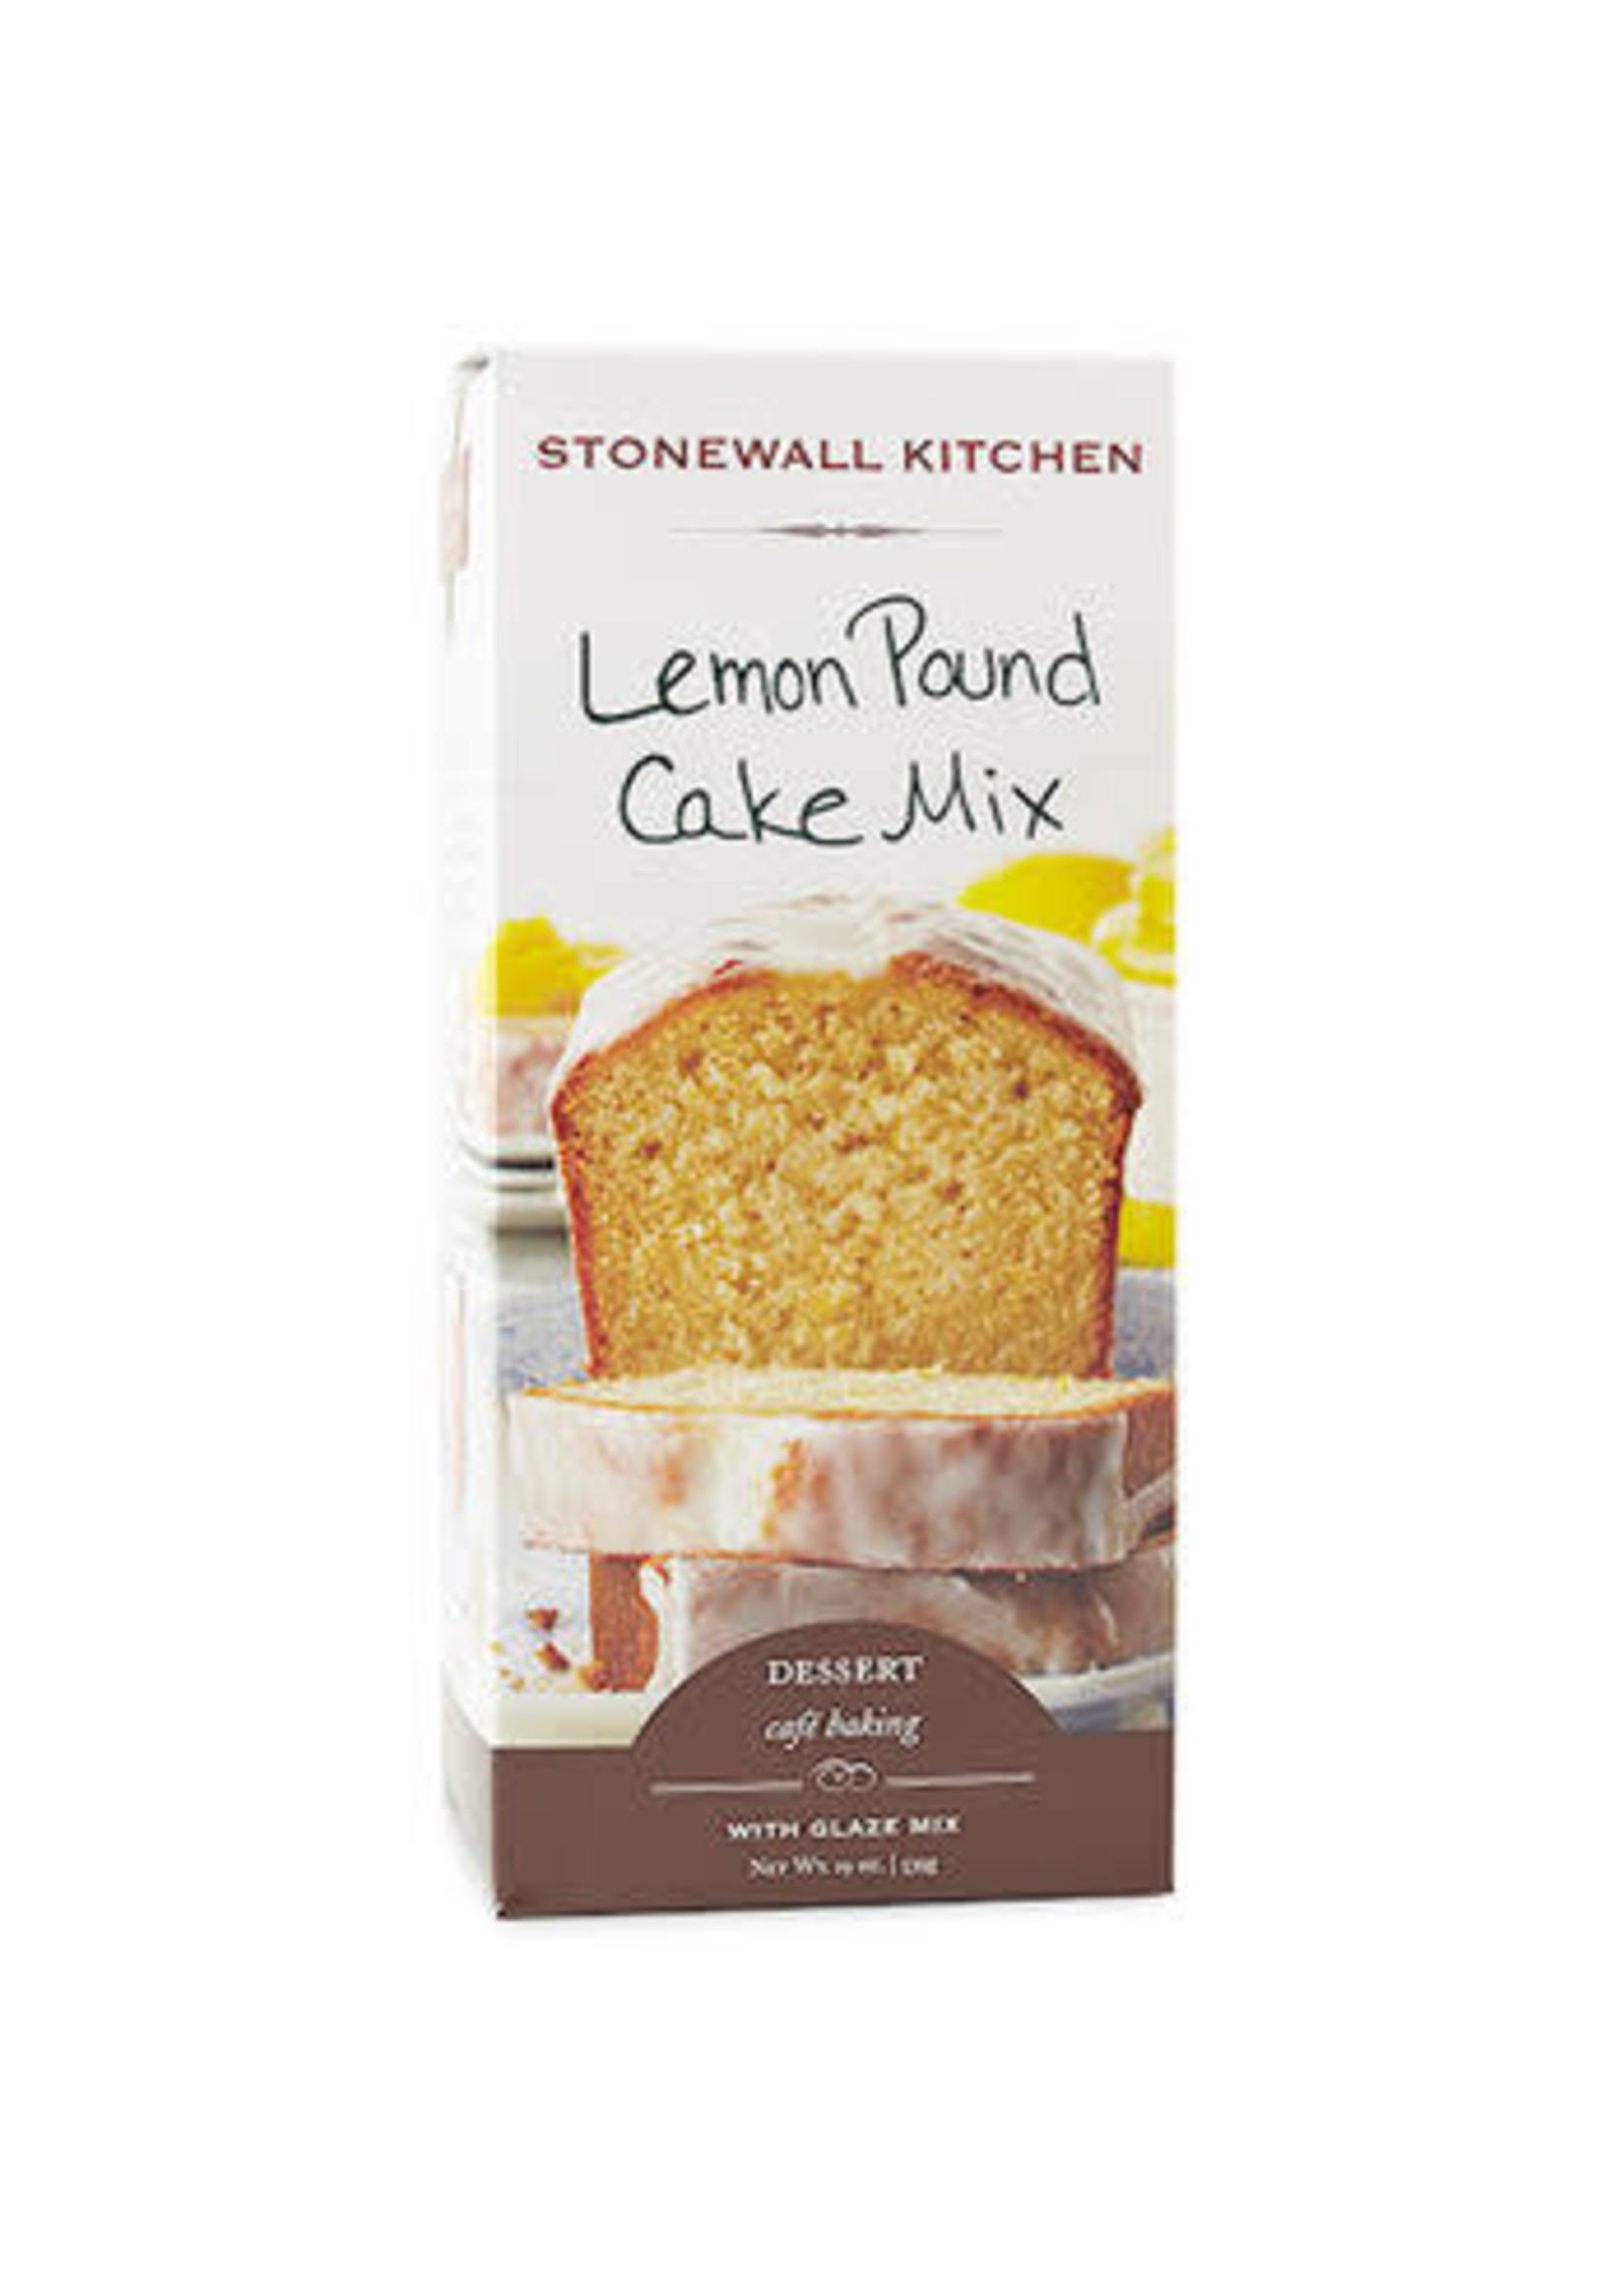 Stonewall Kitchen Lemon Pound Cake Mix w/Glaze